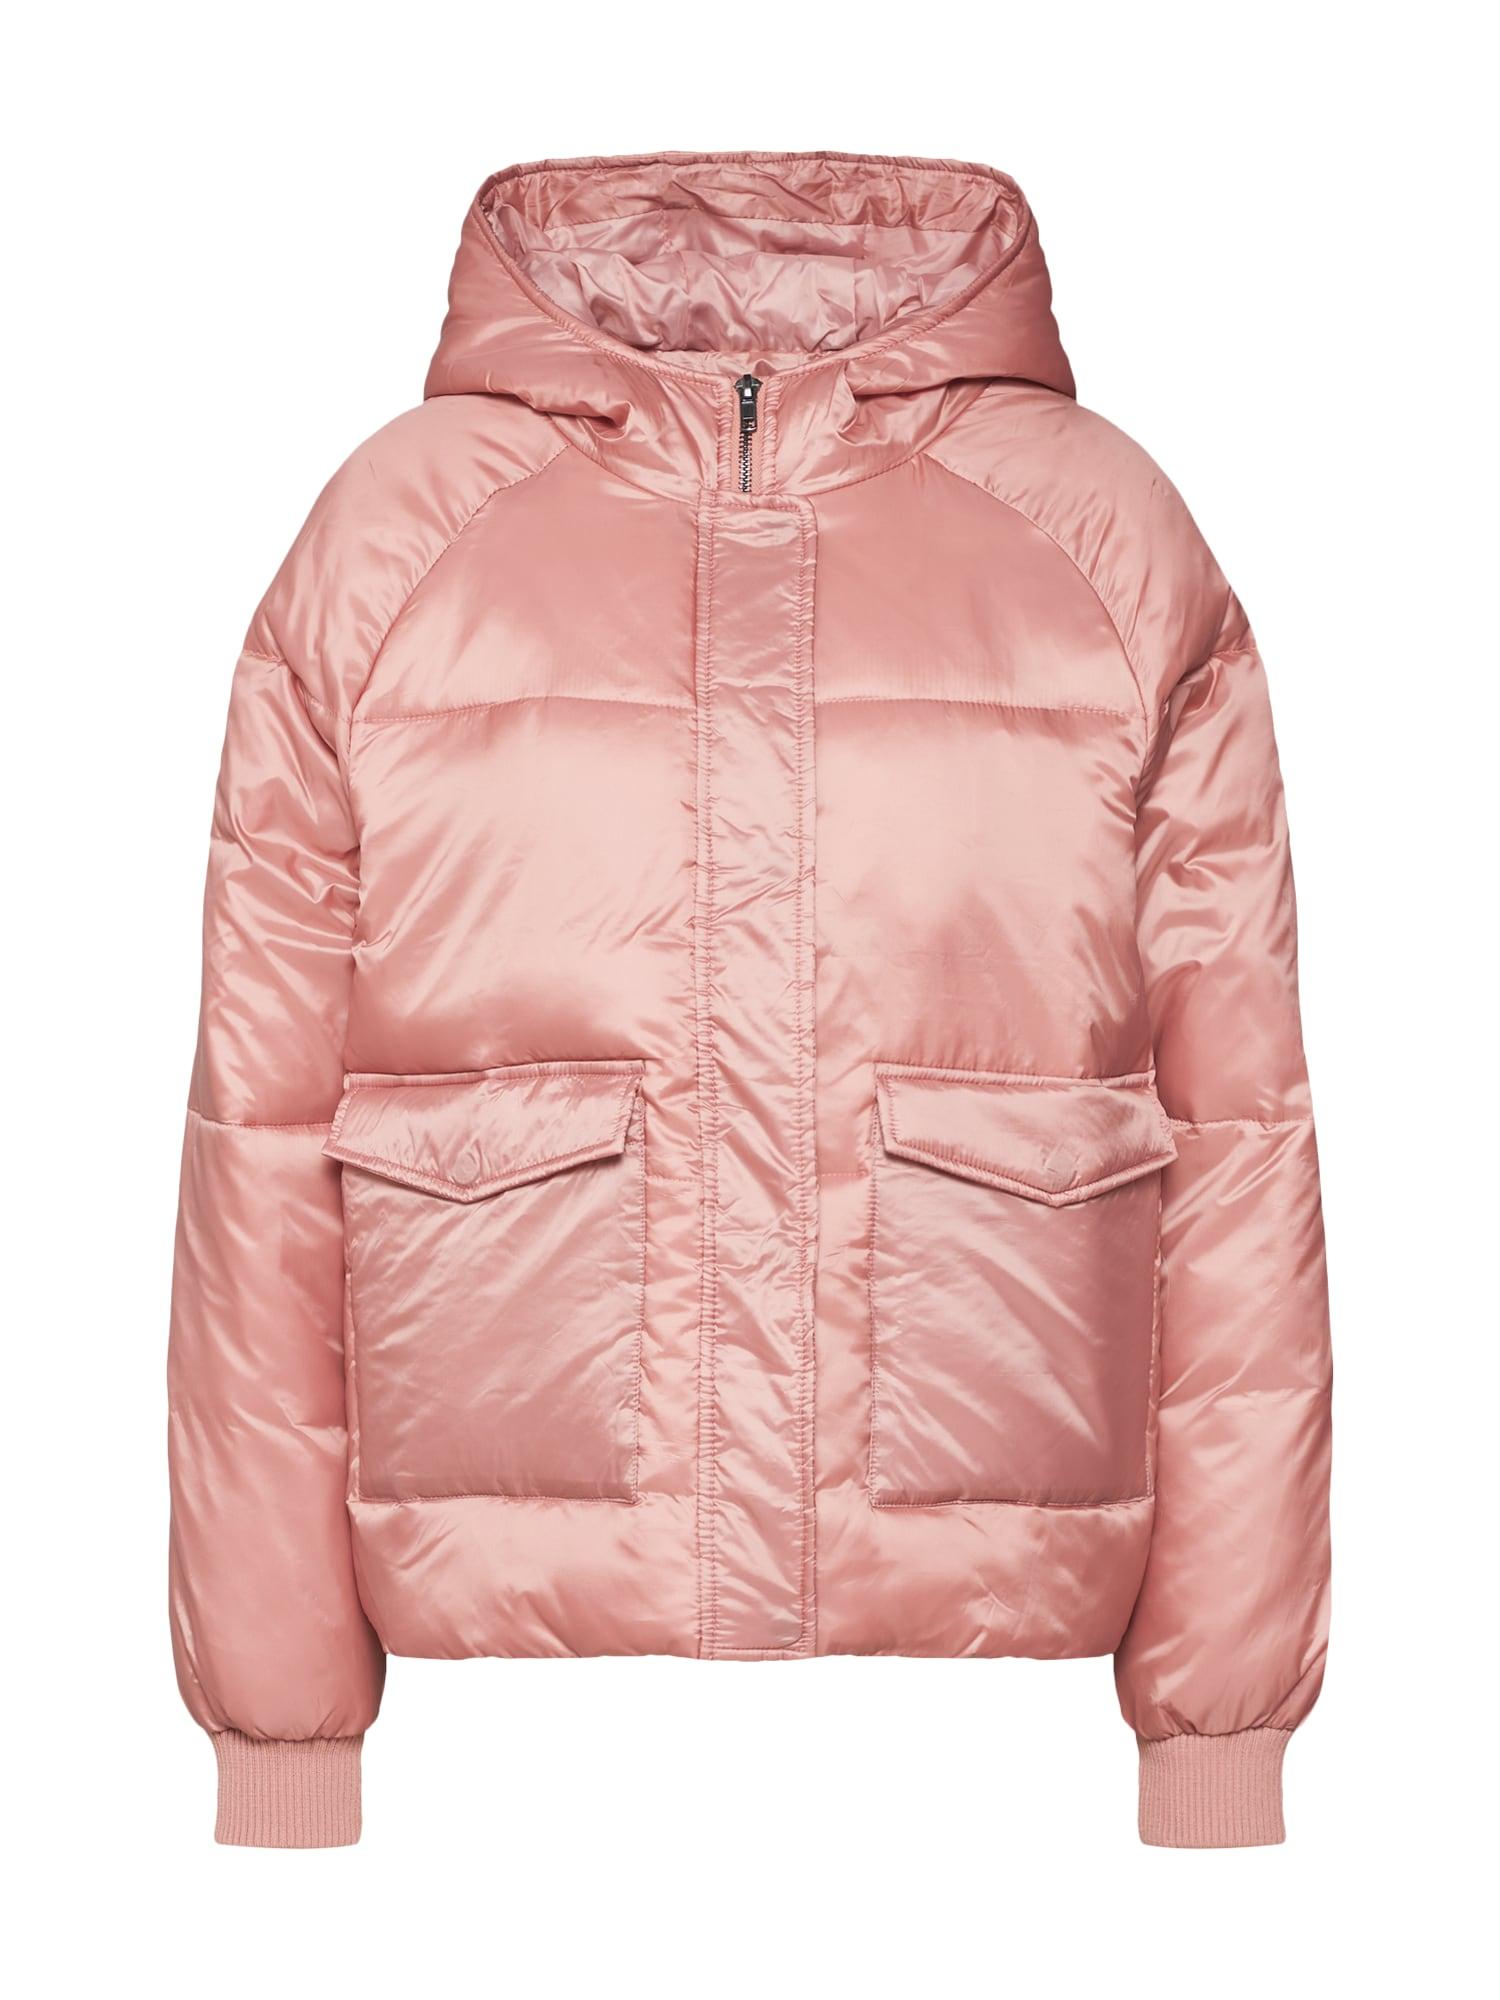 Zimní bunda Arnett růžová SOAKED IN LUXURY